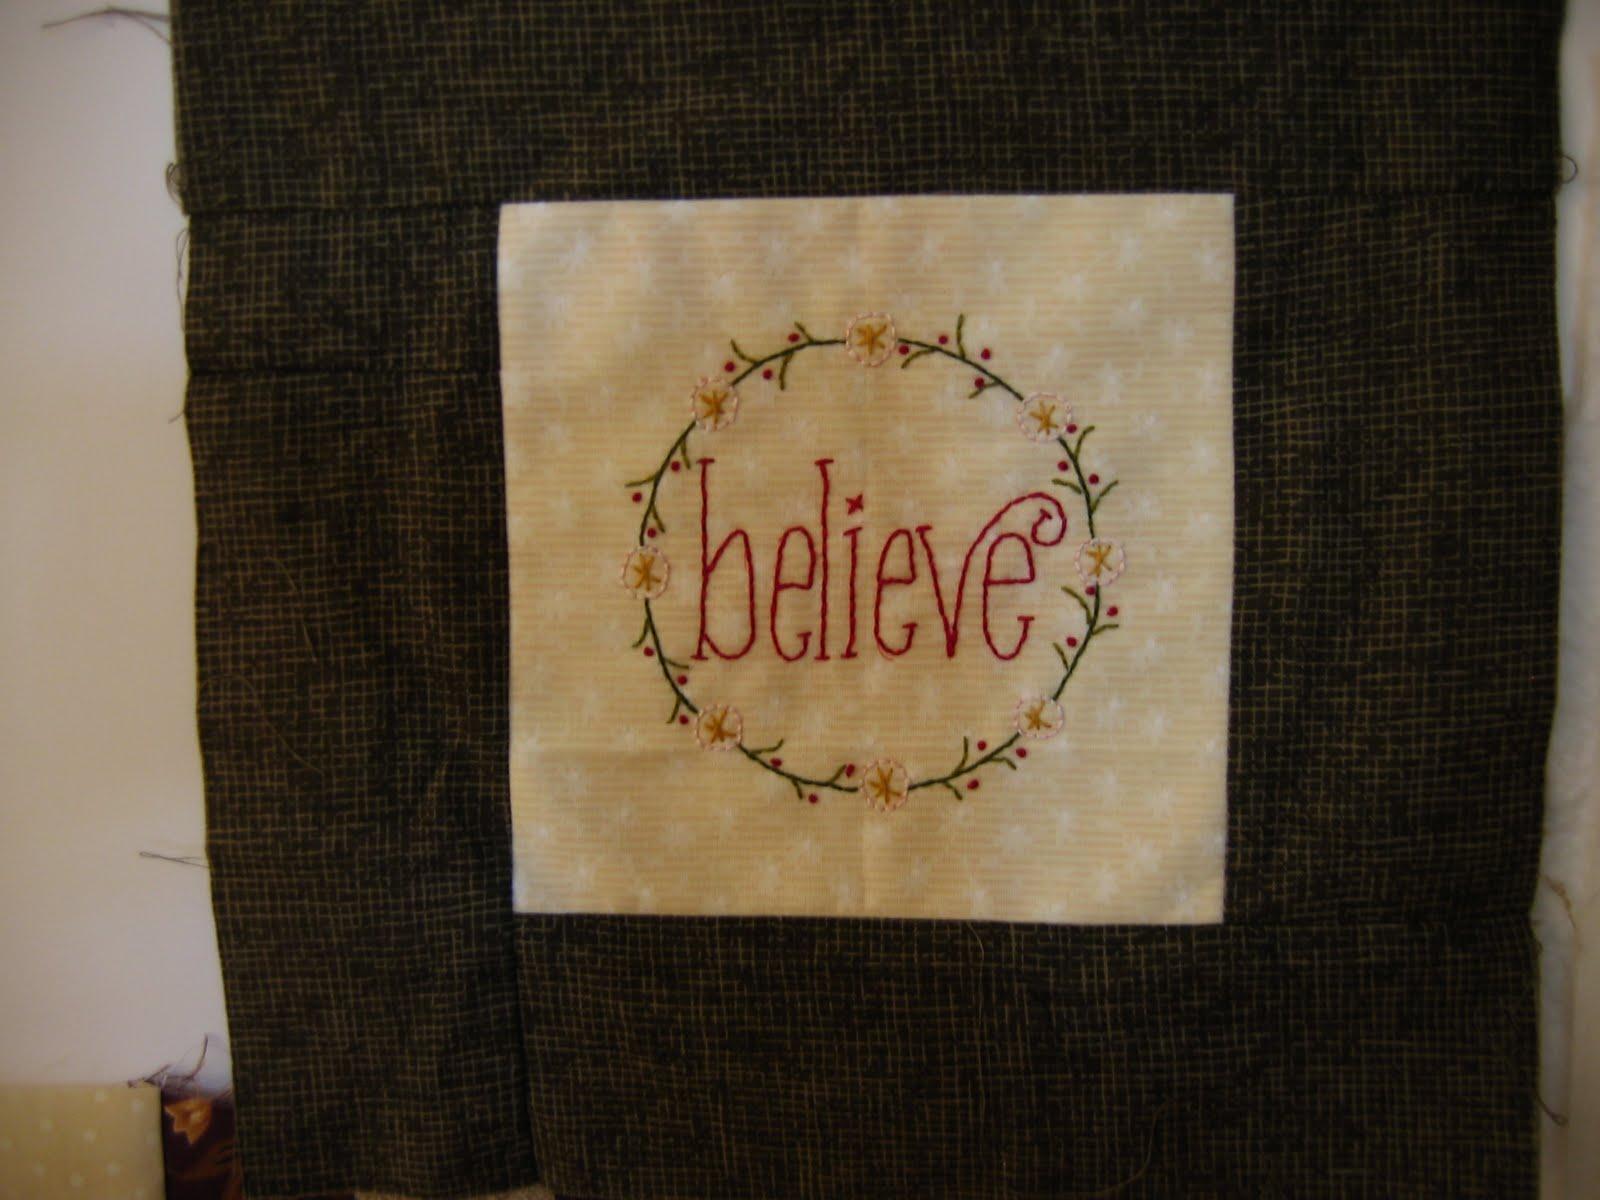 [believe]